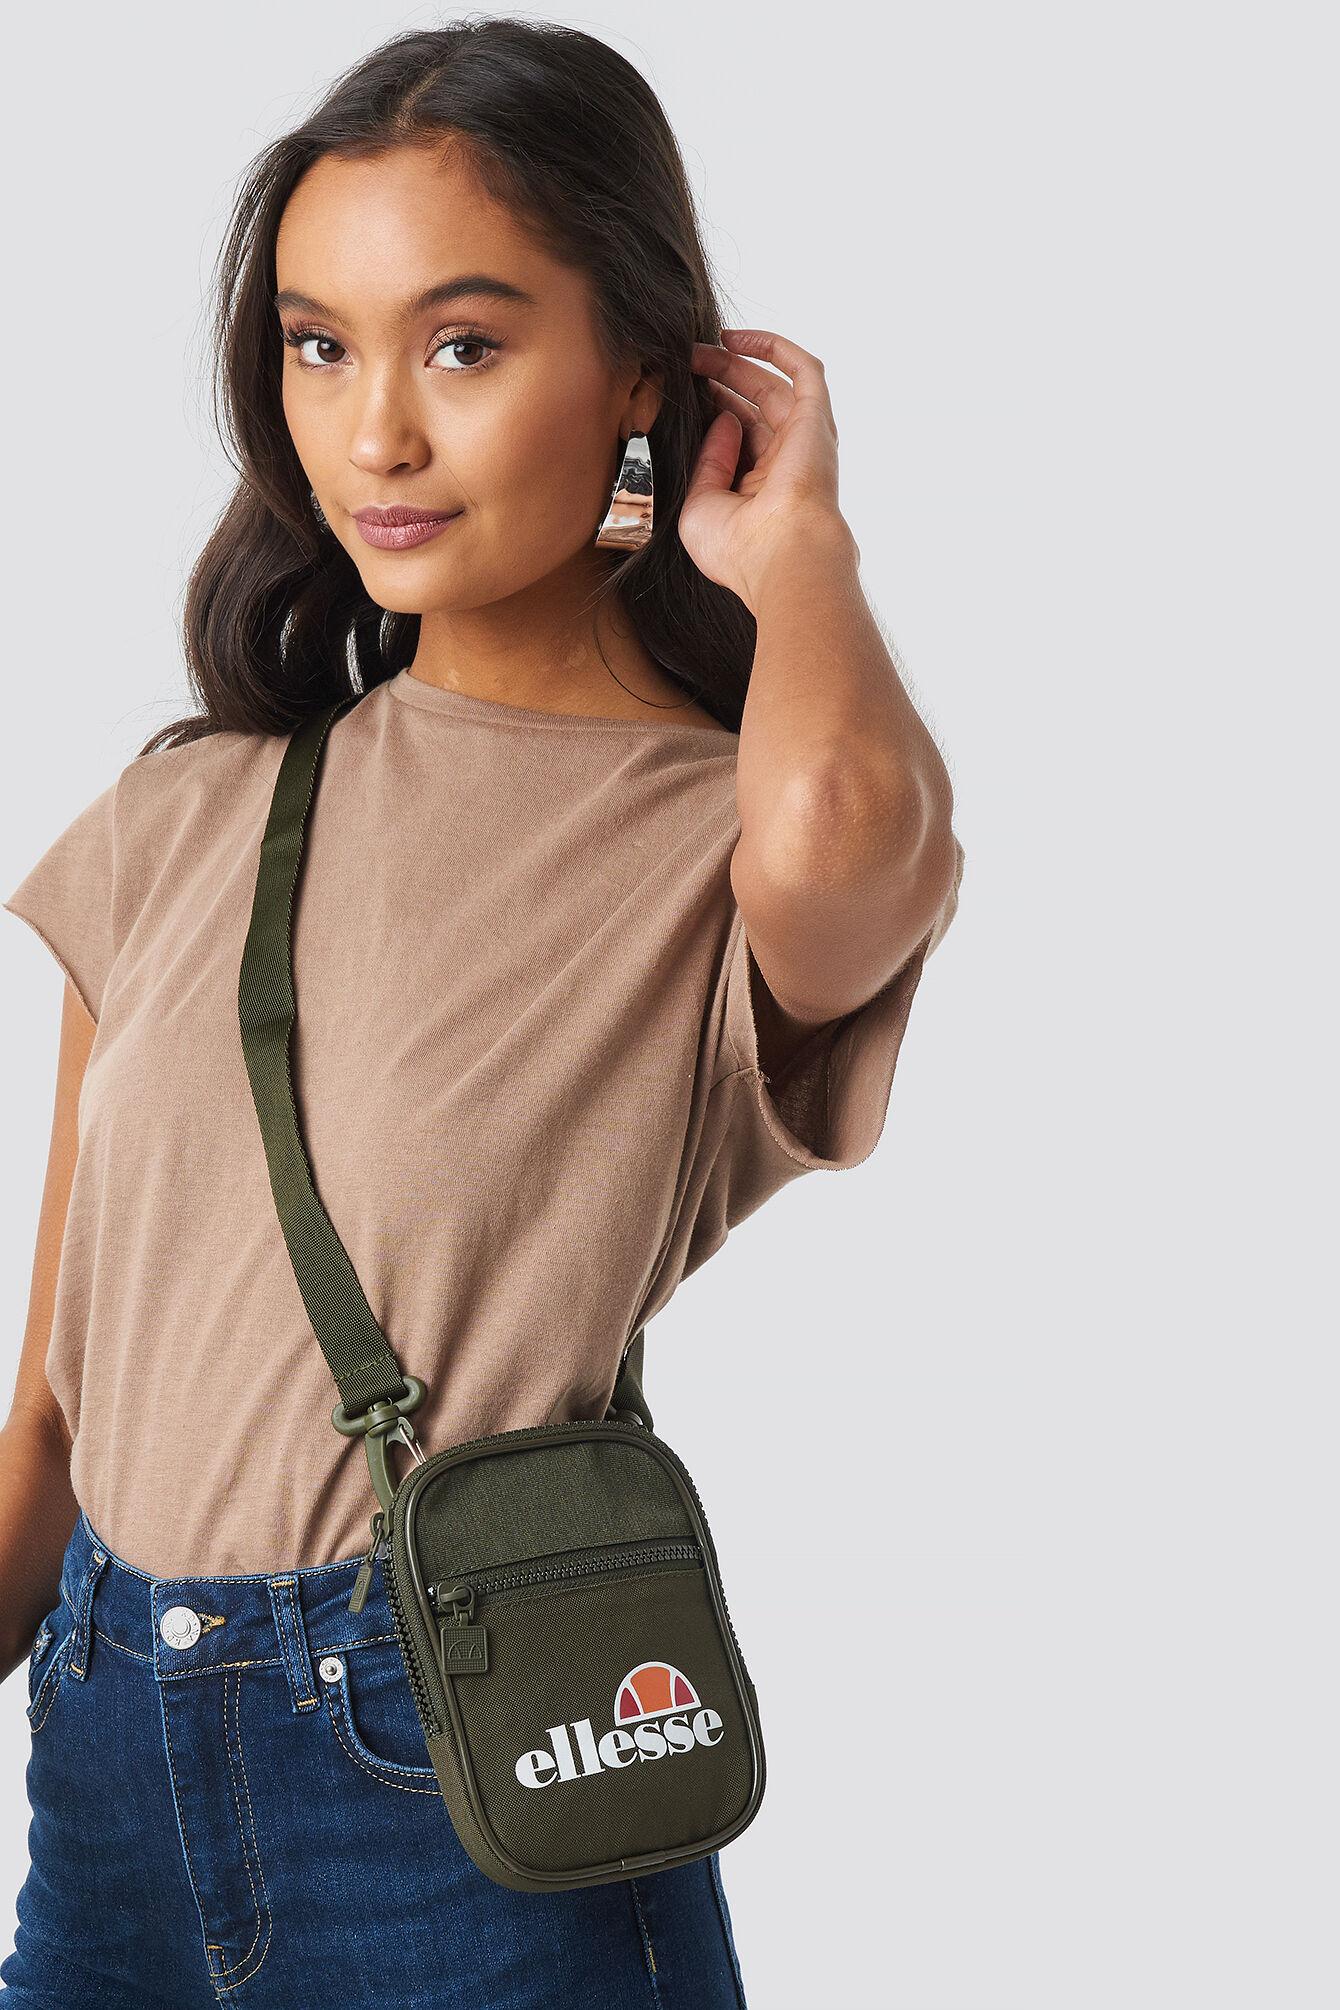 Ellesse El Templeton Bag - Green